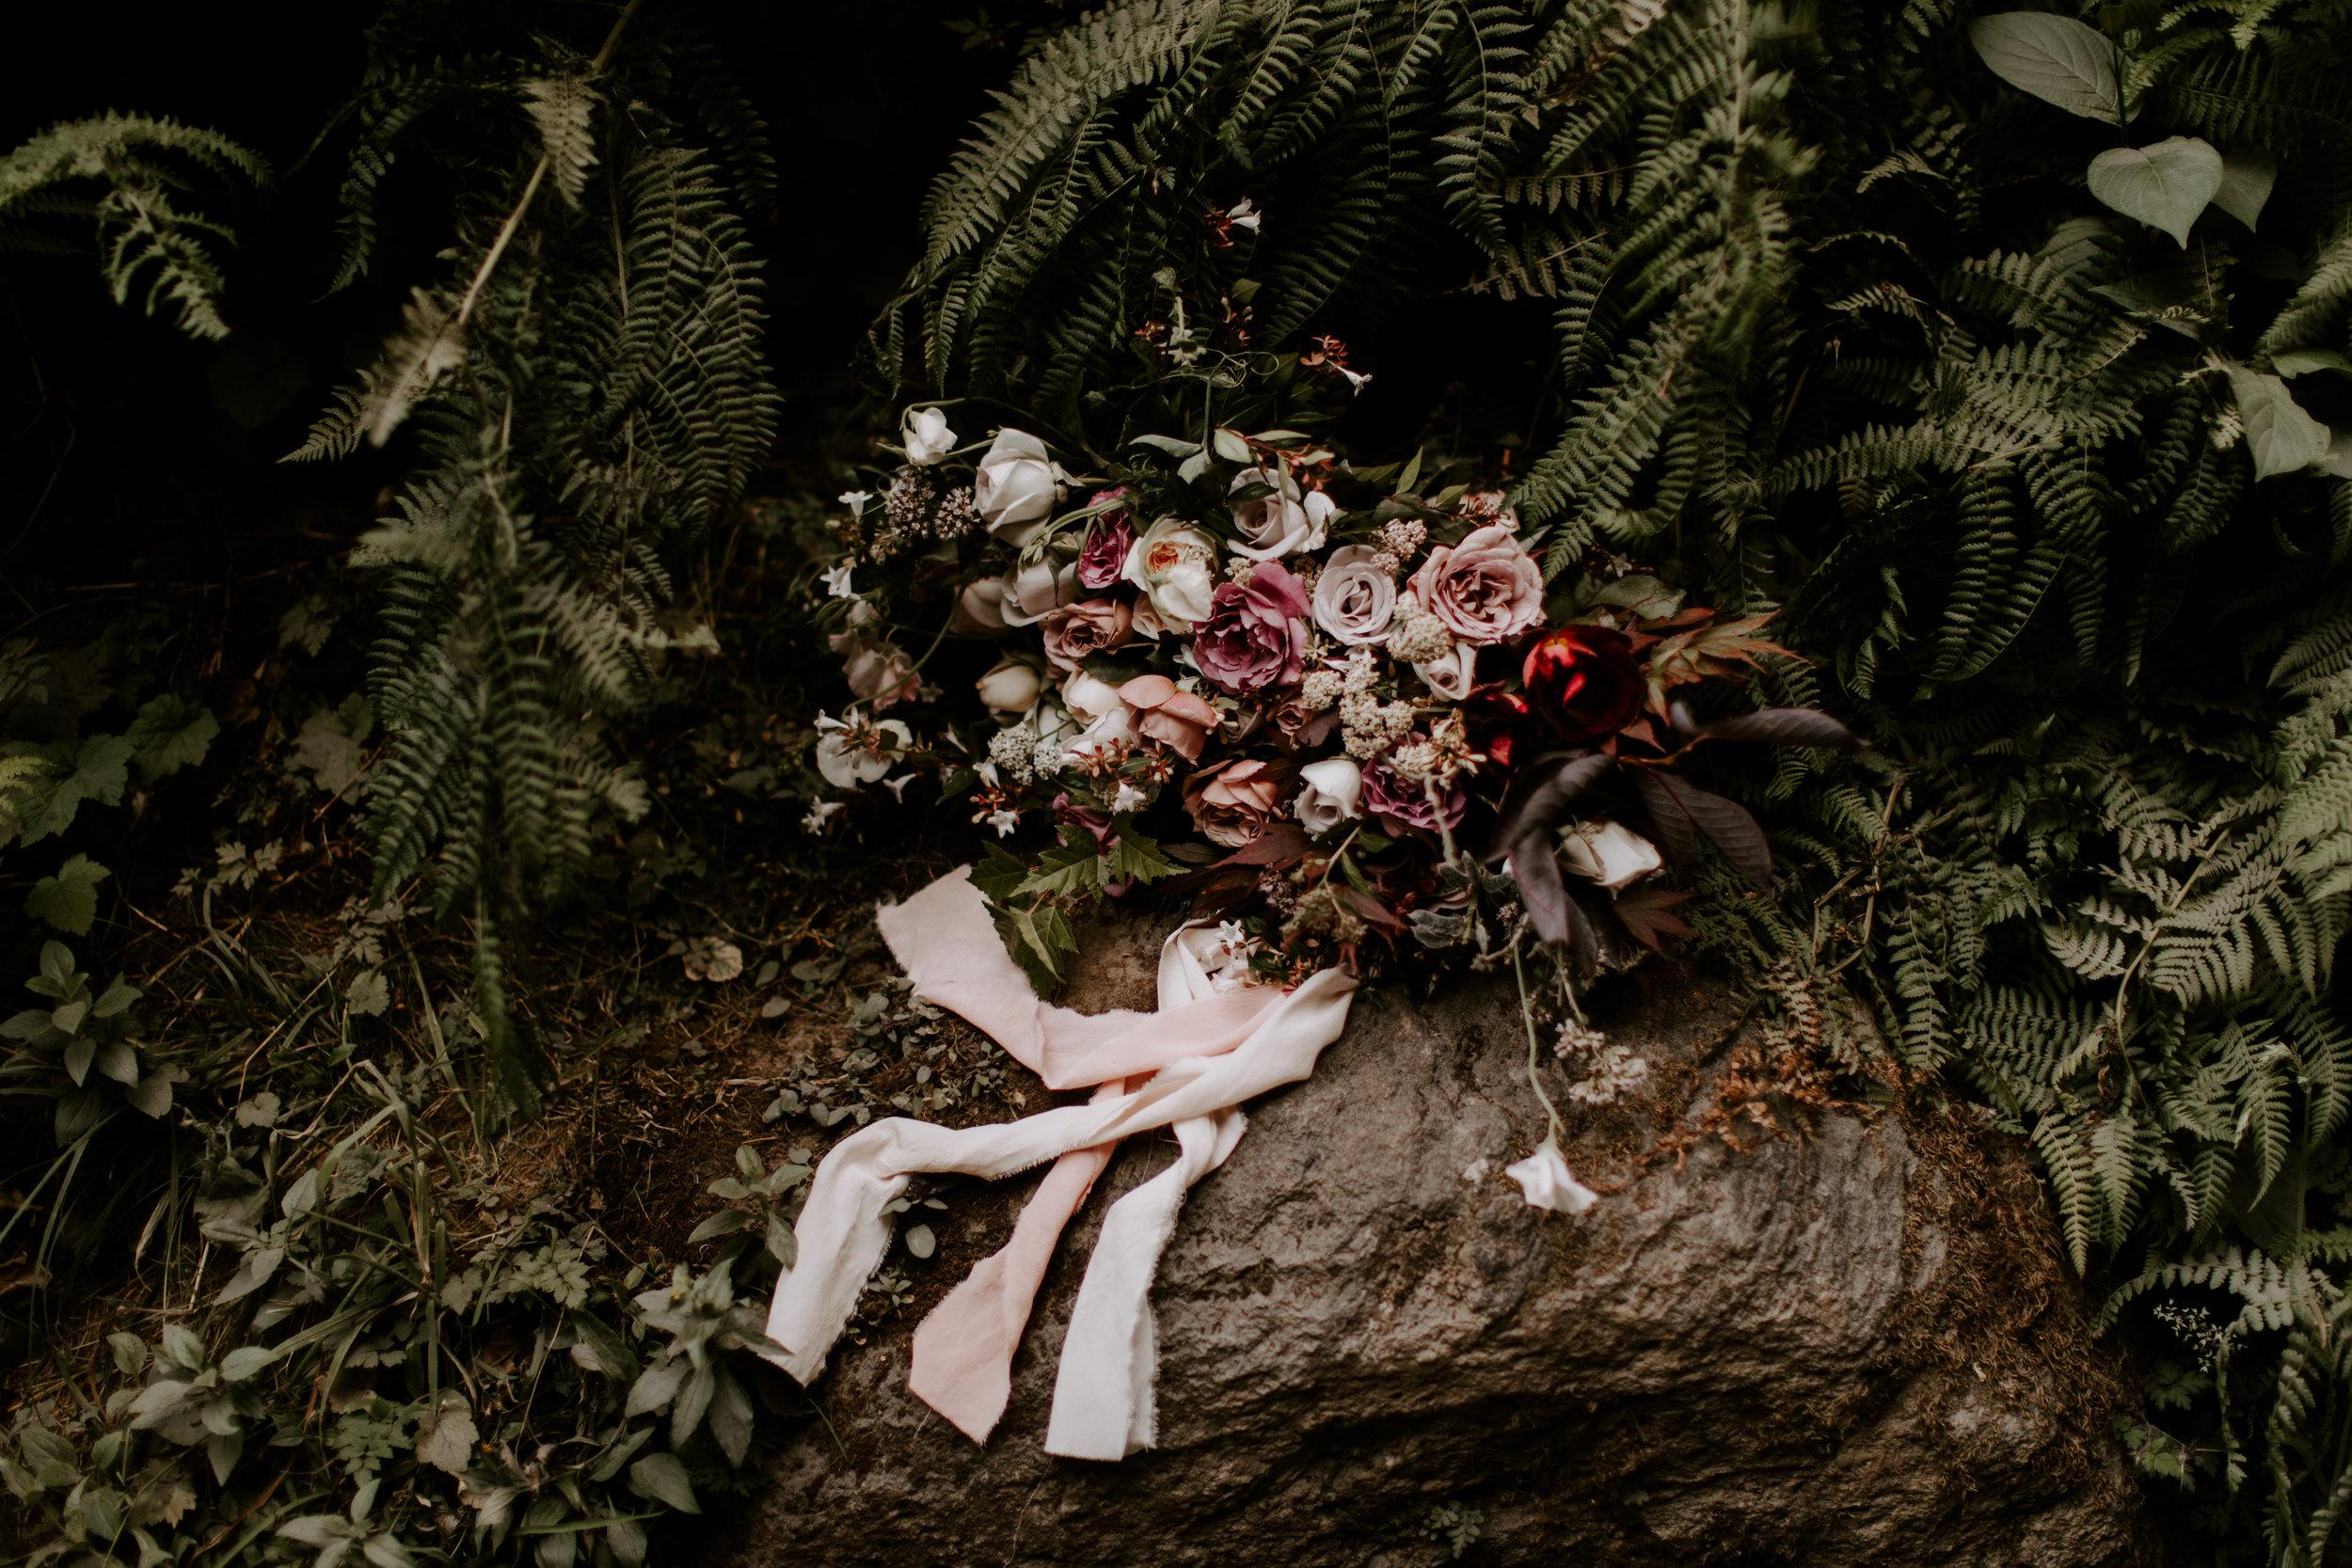 Finals_Madalynn Young Photography-148.JPG